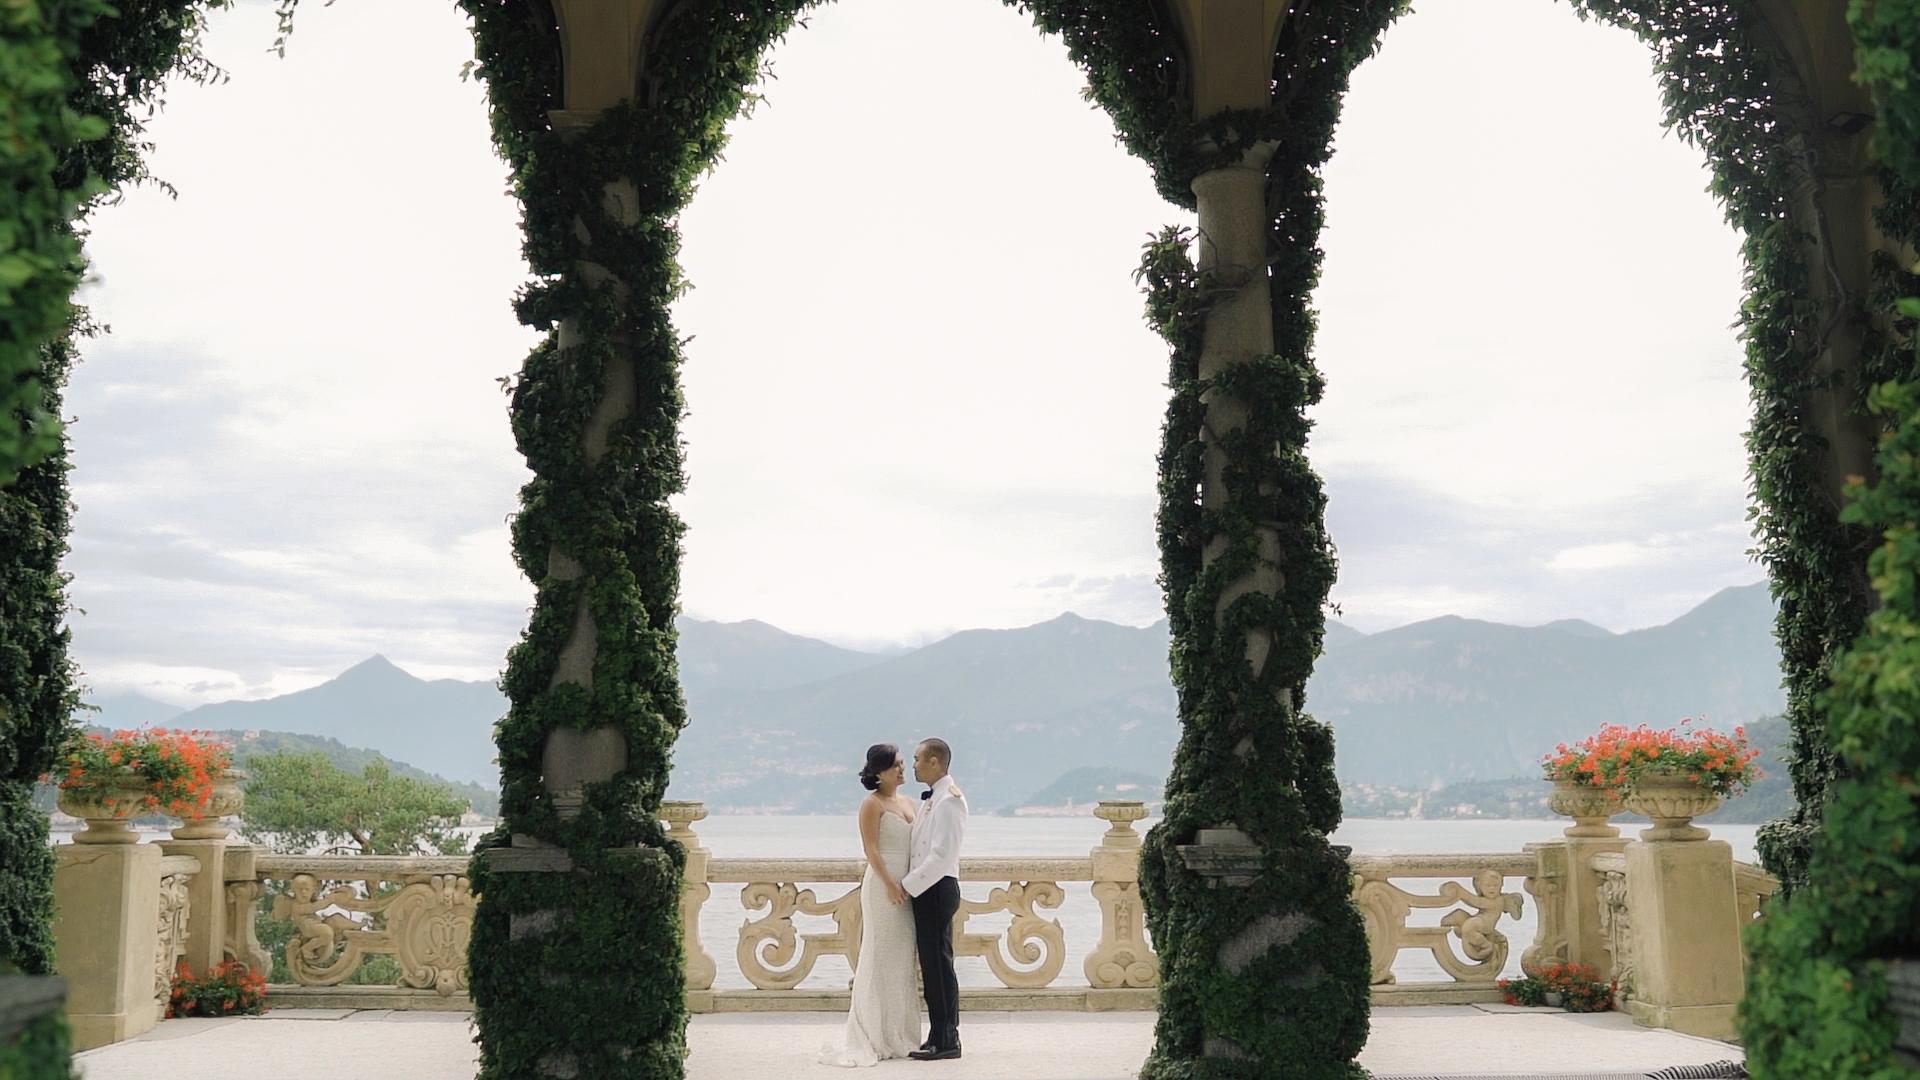 Lake como_ villa Balbianello_wedding_-2.jpg